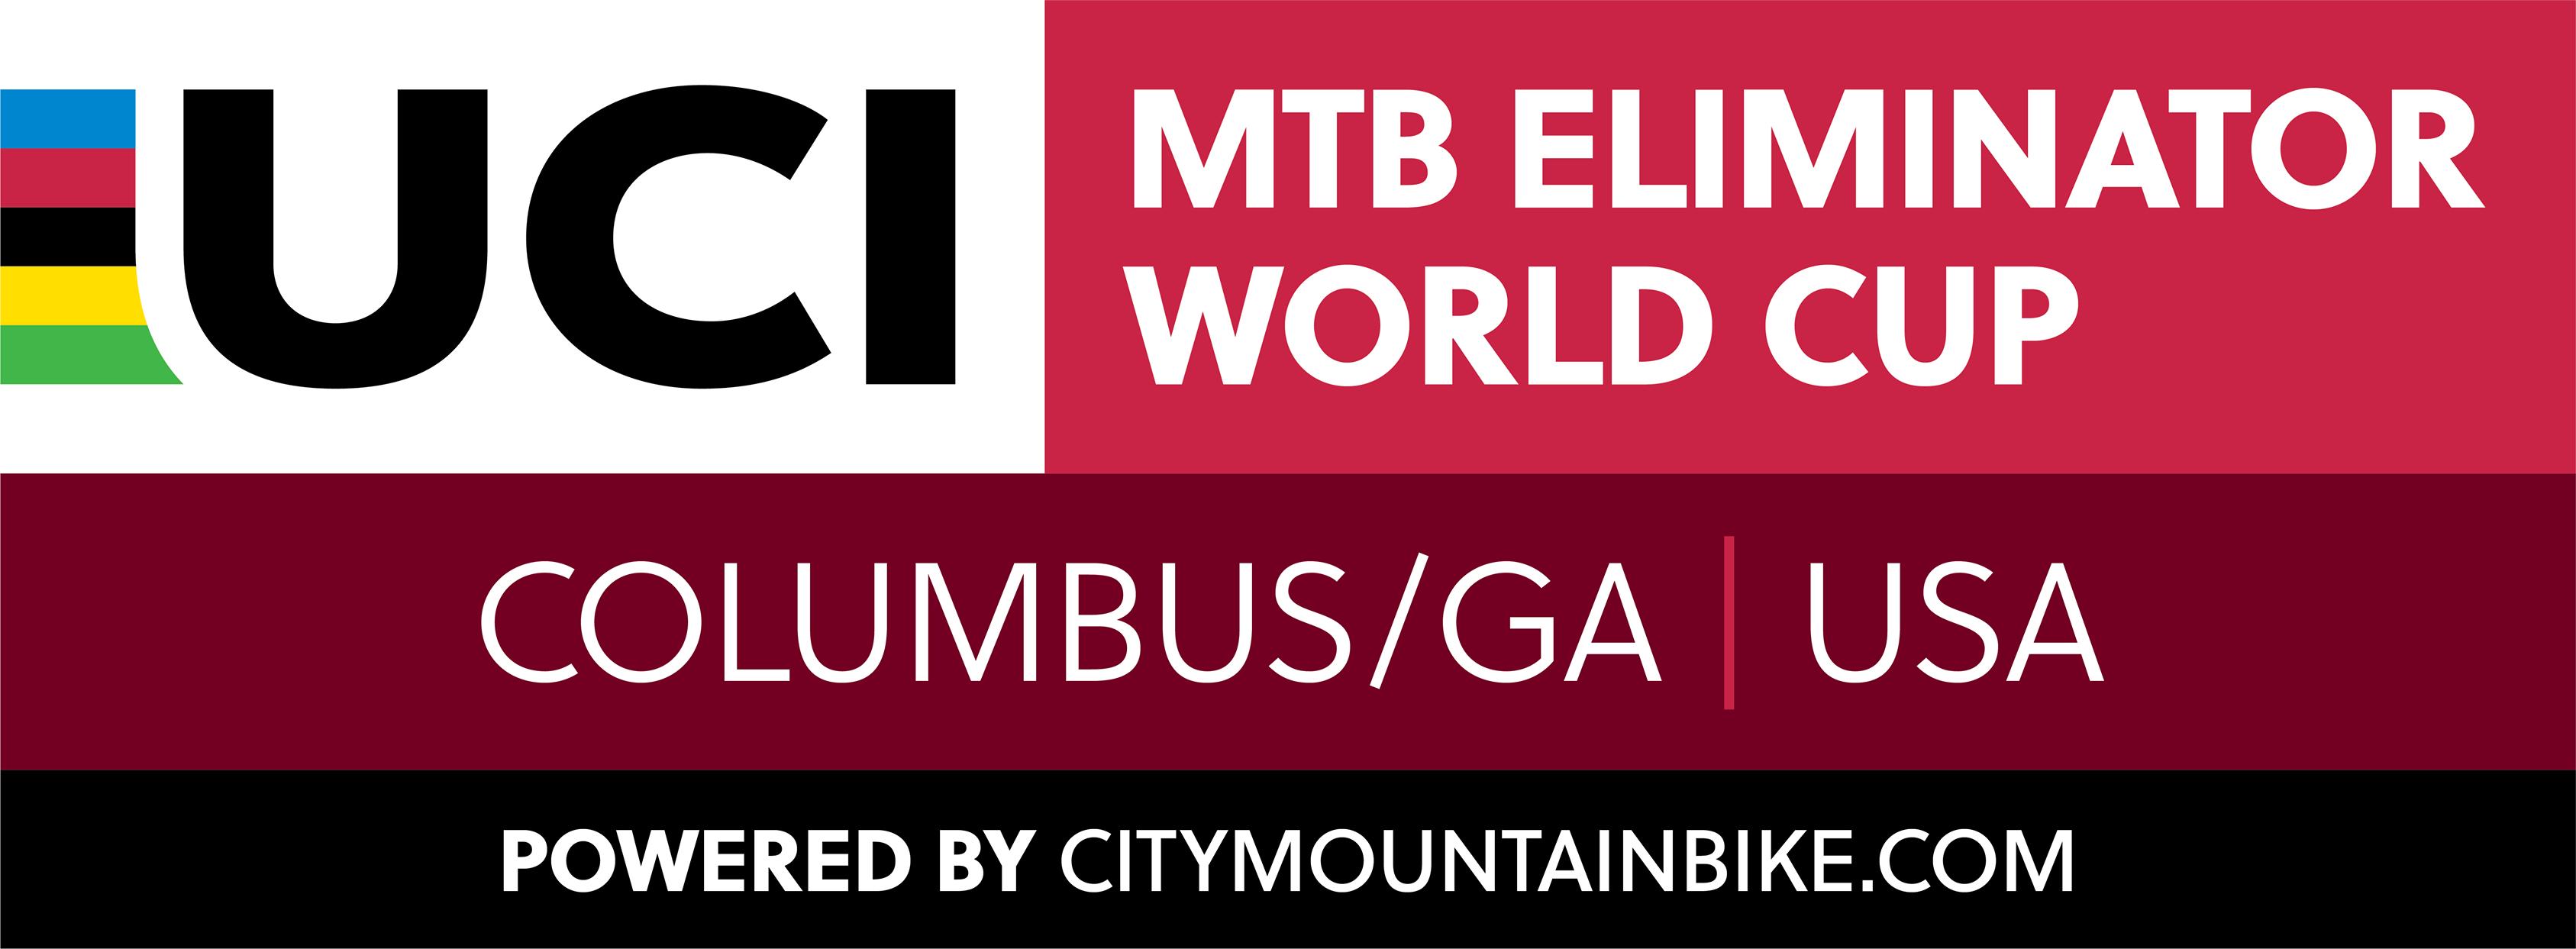 """City Mountain Bike"""